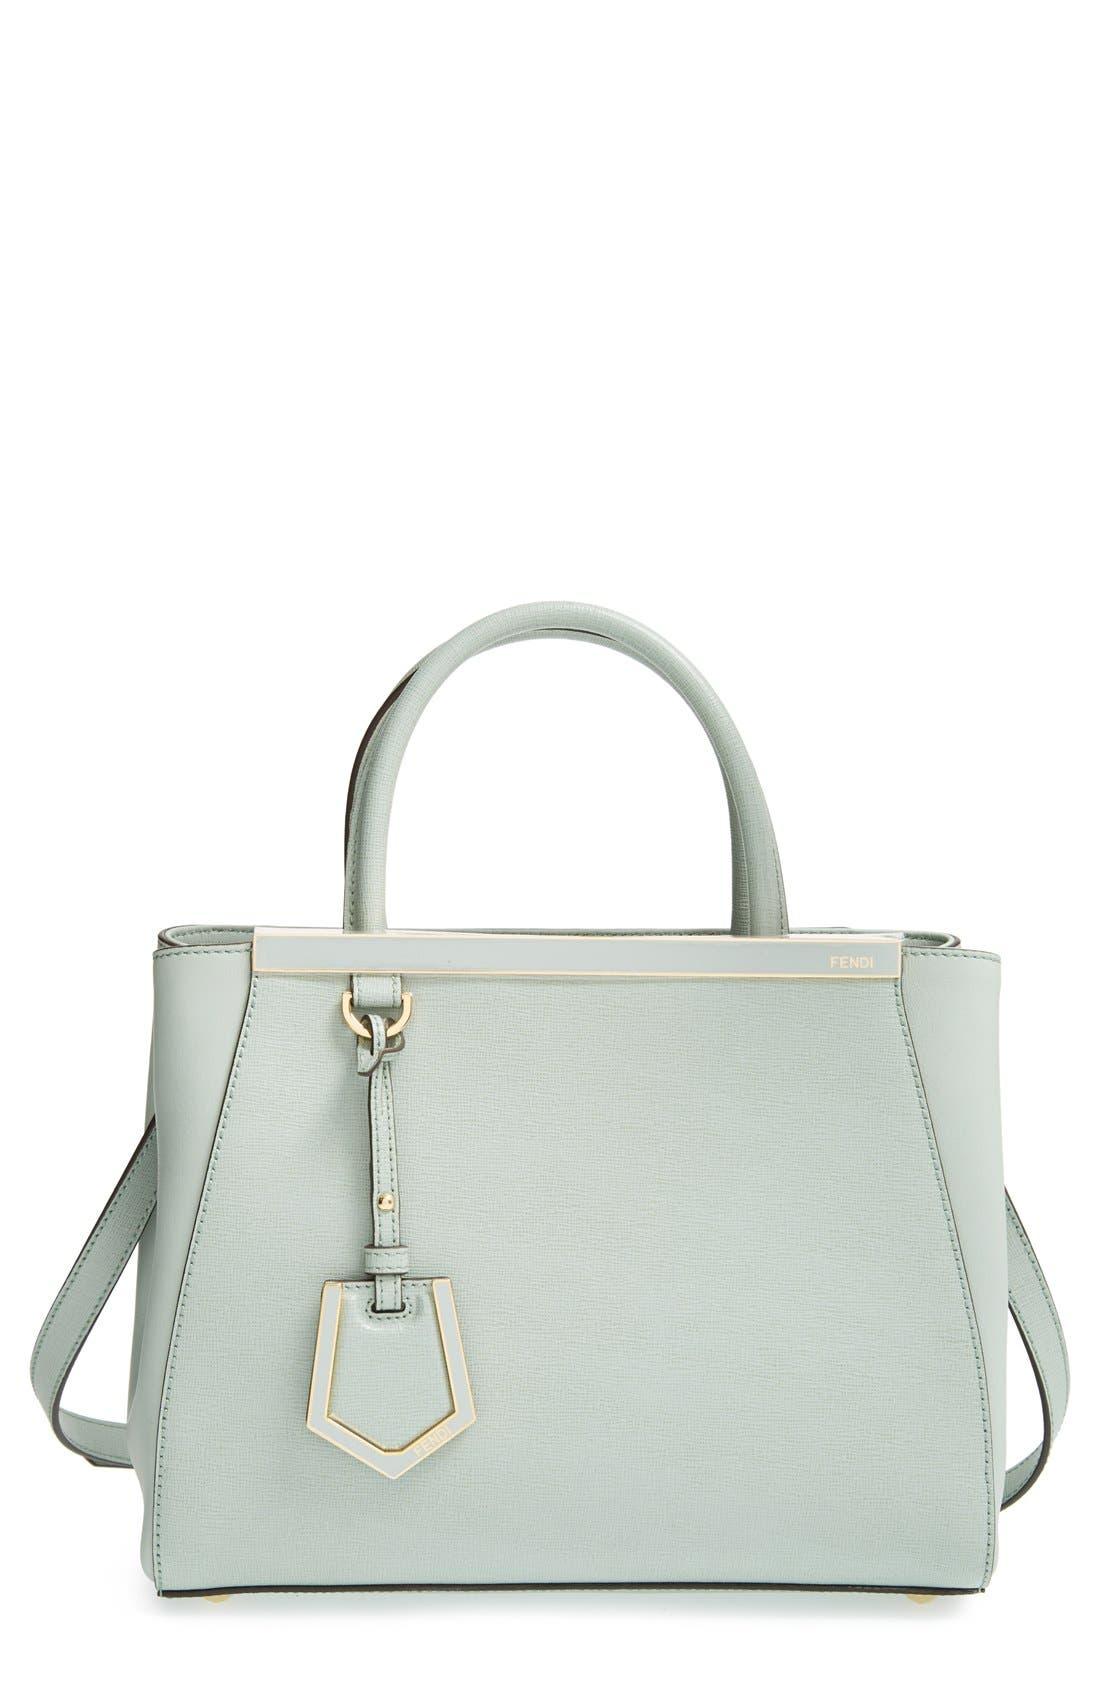 Fendi Womens Handbags Purses